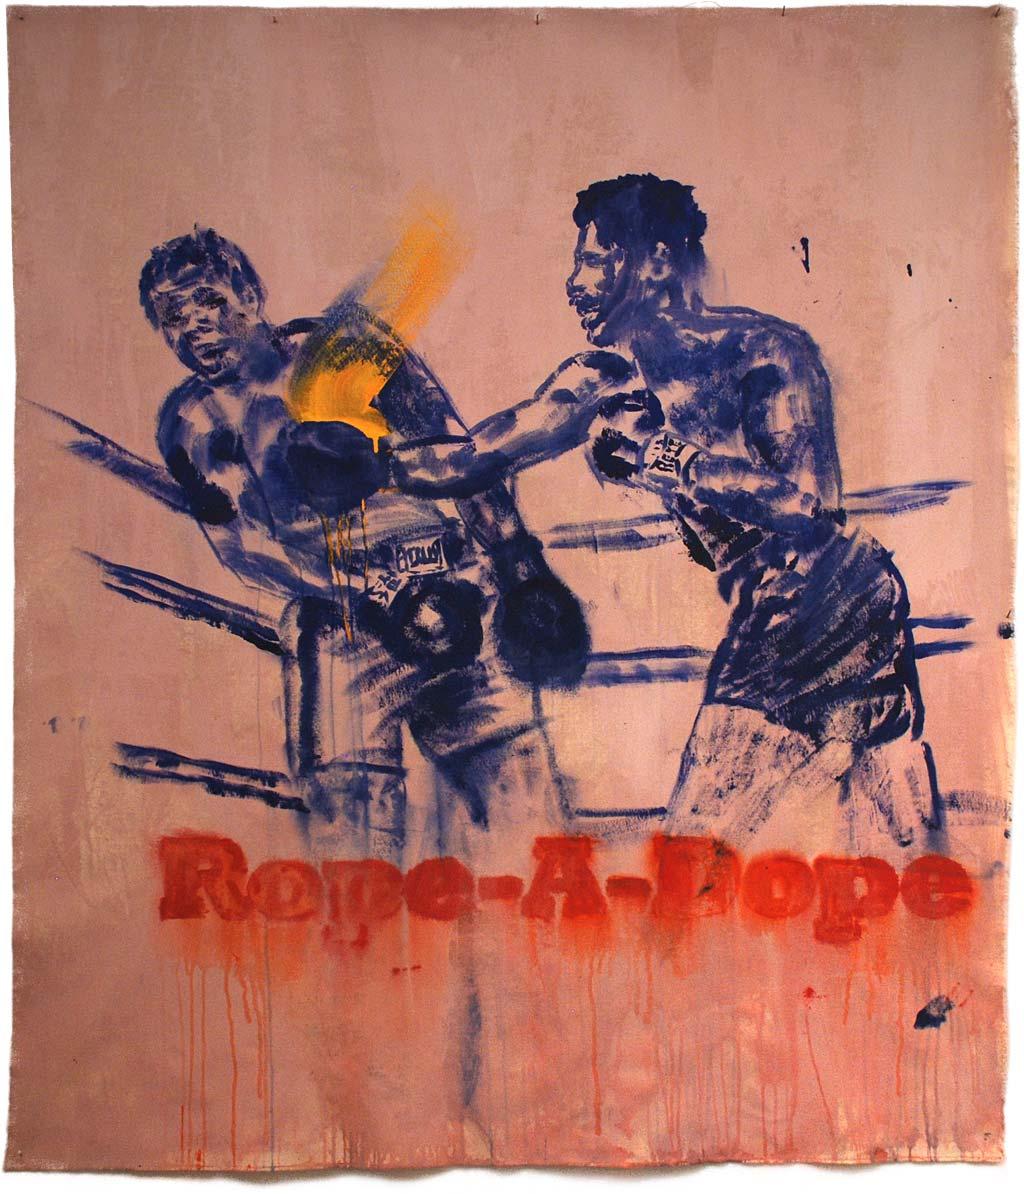 Johnny O'Brady ROPE-A-DOPE - details